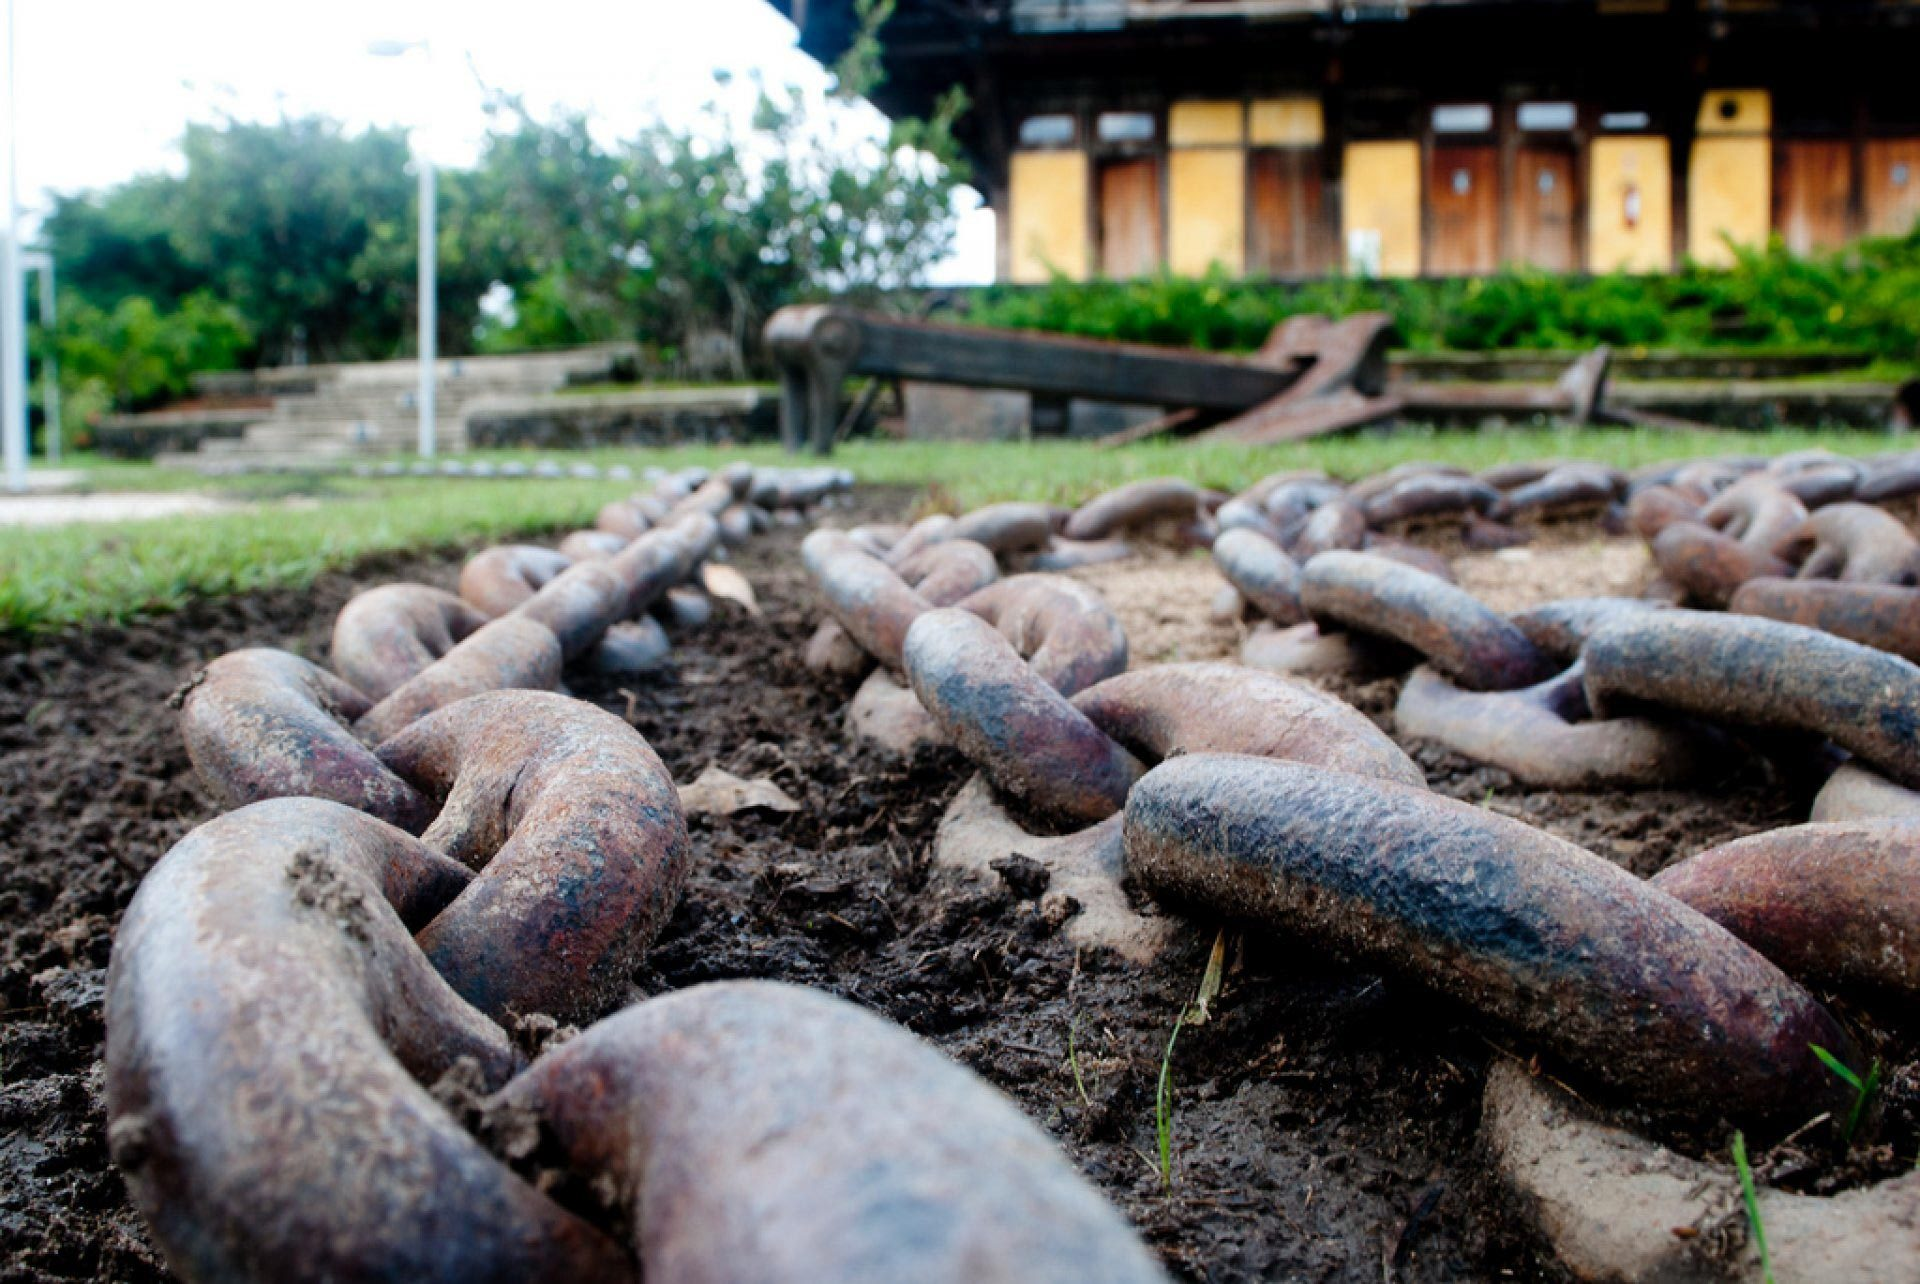 Mangal das garças - Belém do Pará